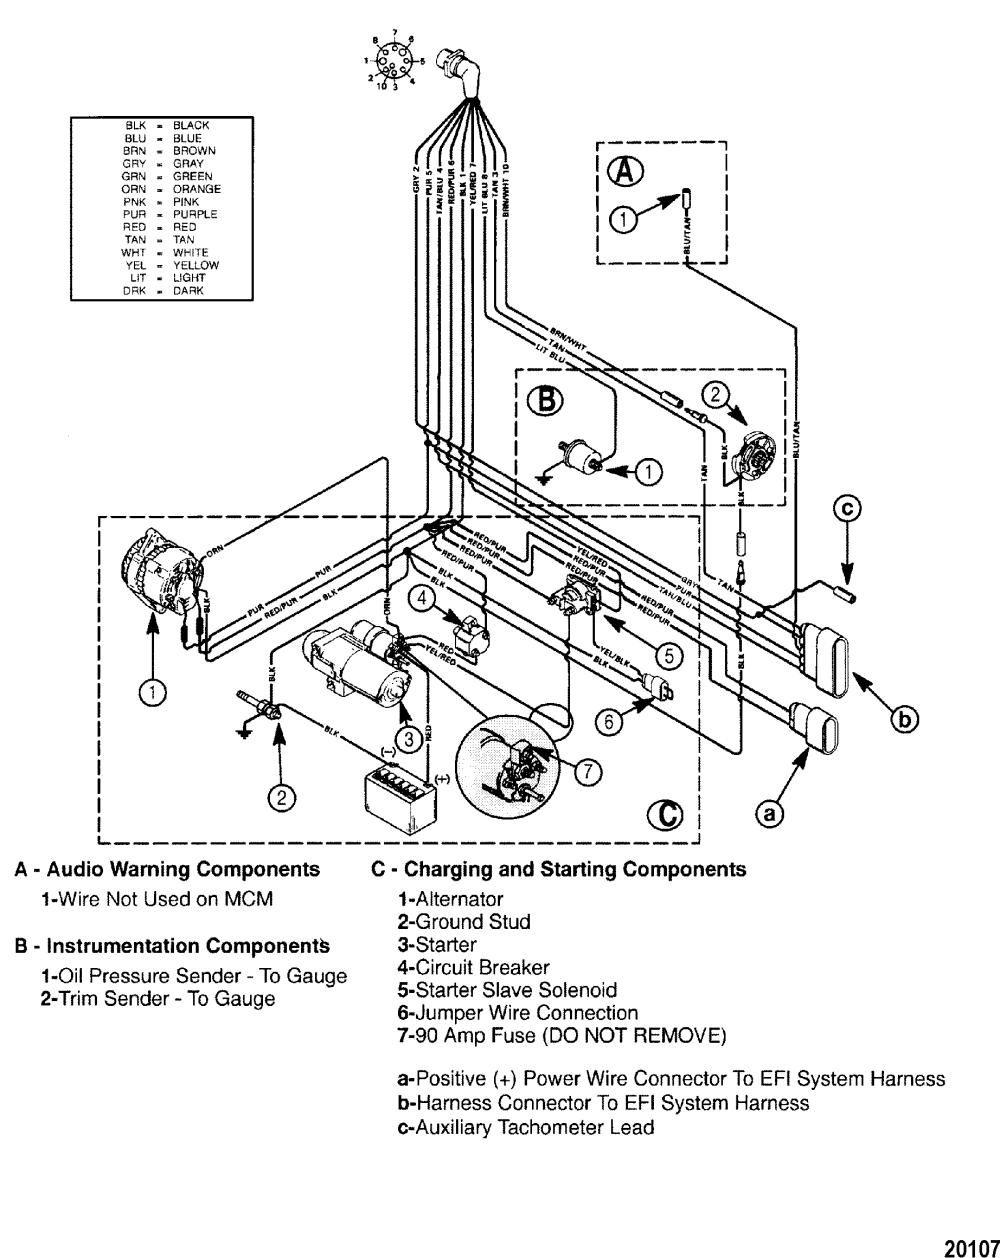 medium resolution of 454 mag mpi bravo gen 6 gm v 8 serial 0l085400 thru 0m024999 wiring harness engine